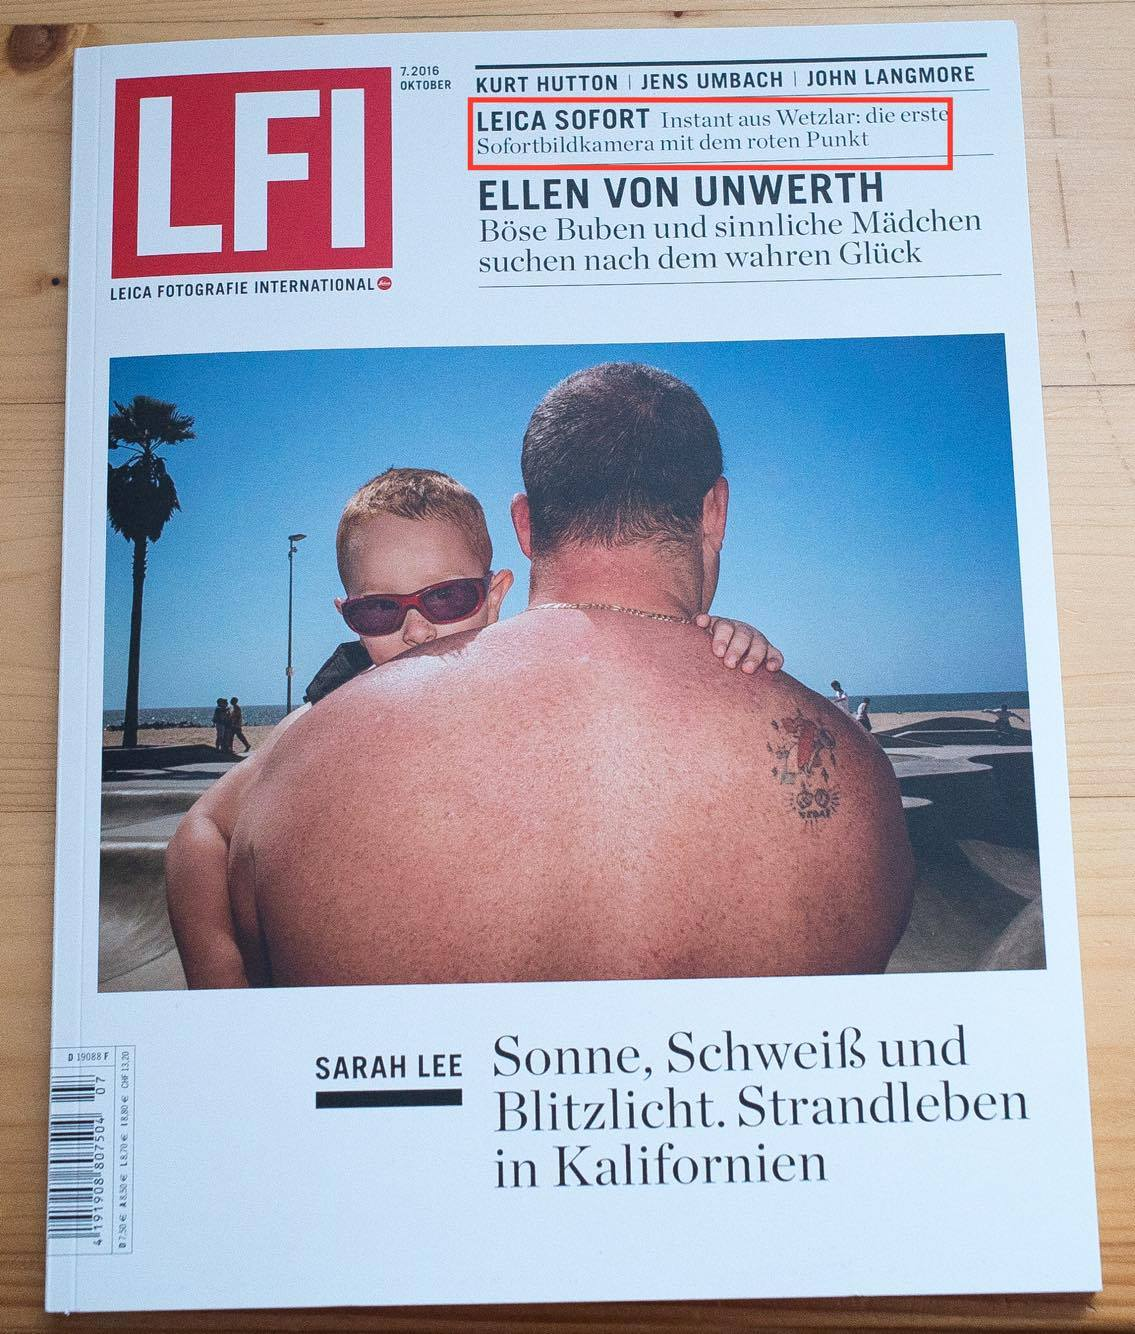 leica-sofort-instant-camera-leaked-in-lfi-magazine-2